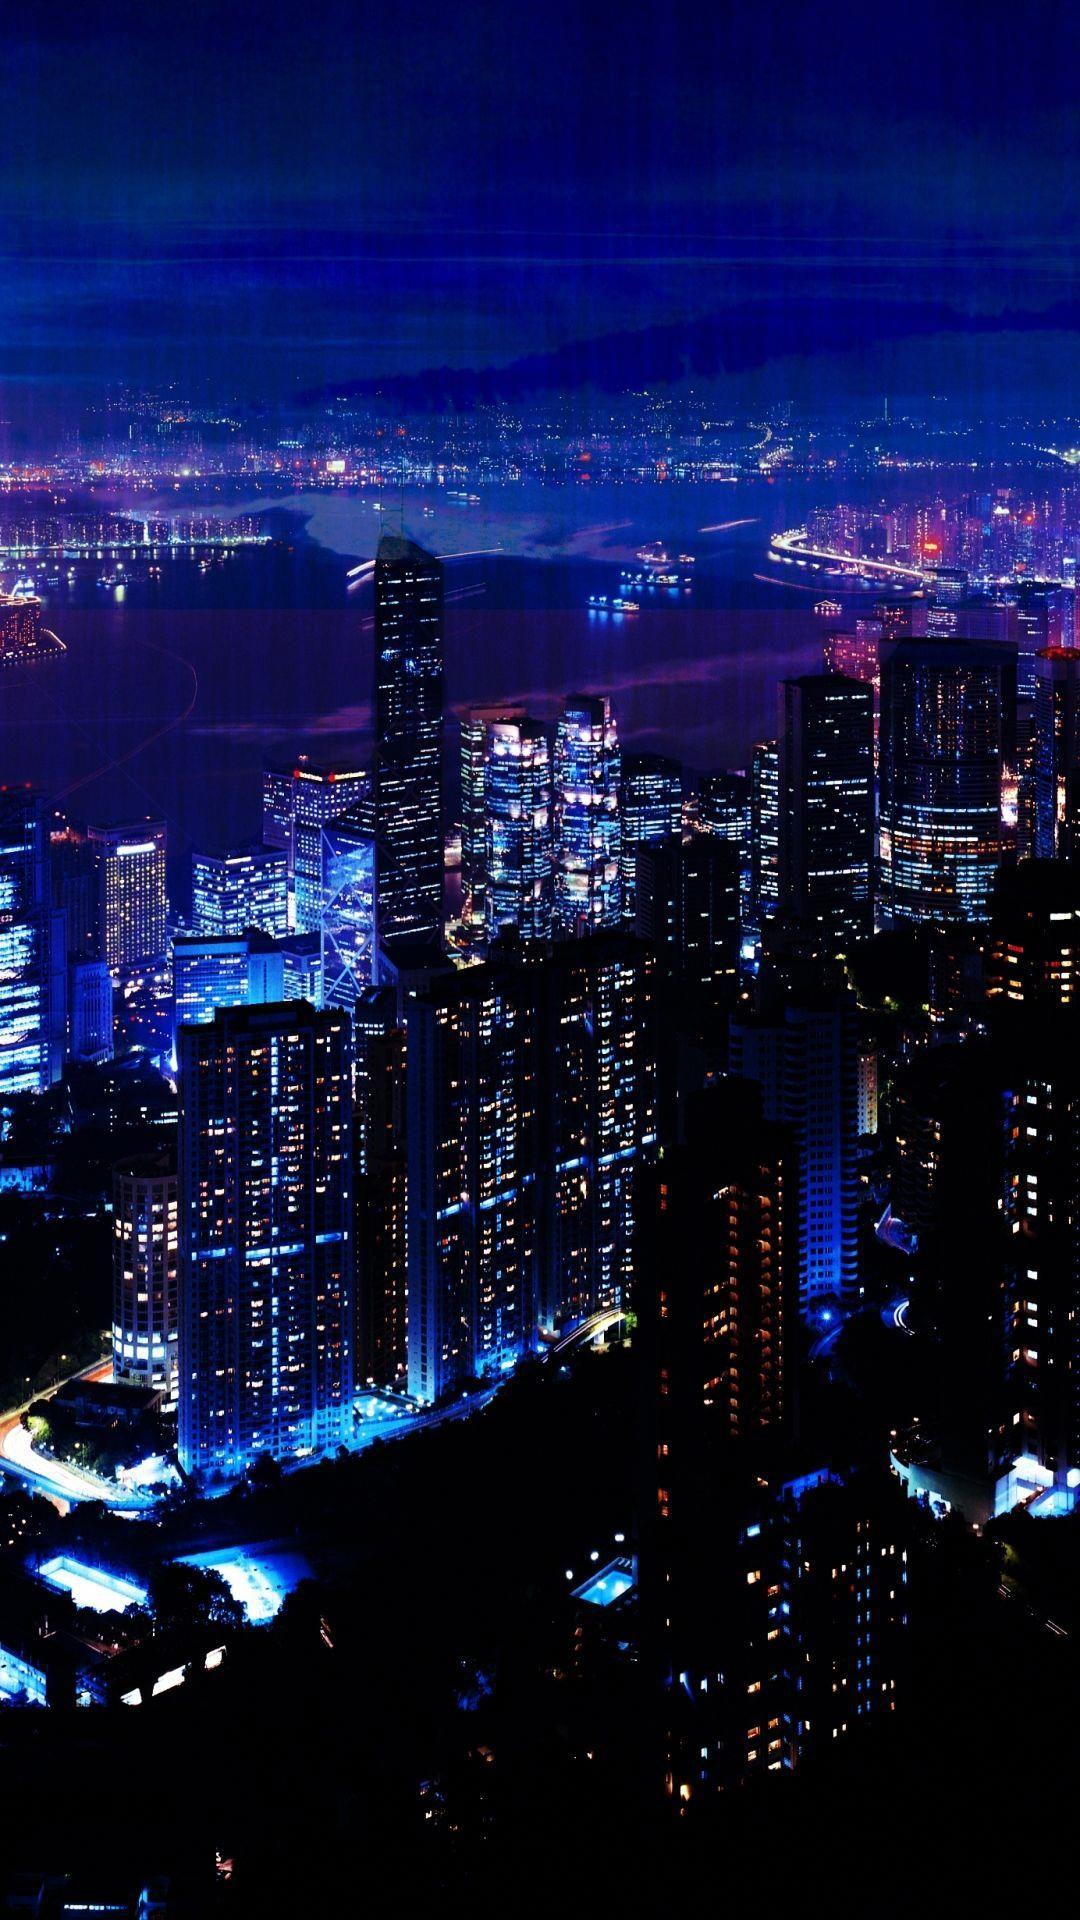 Night City Sky Skyscrapers Iphone 8 Wallpapers City Wallpaper City Lights Wallpaper City Sky